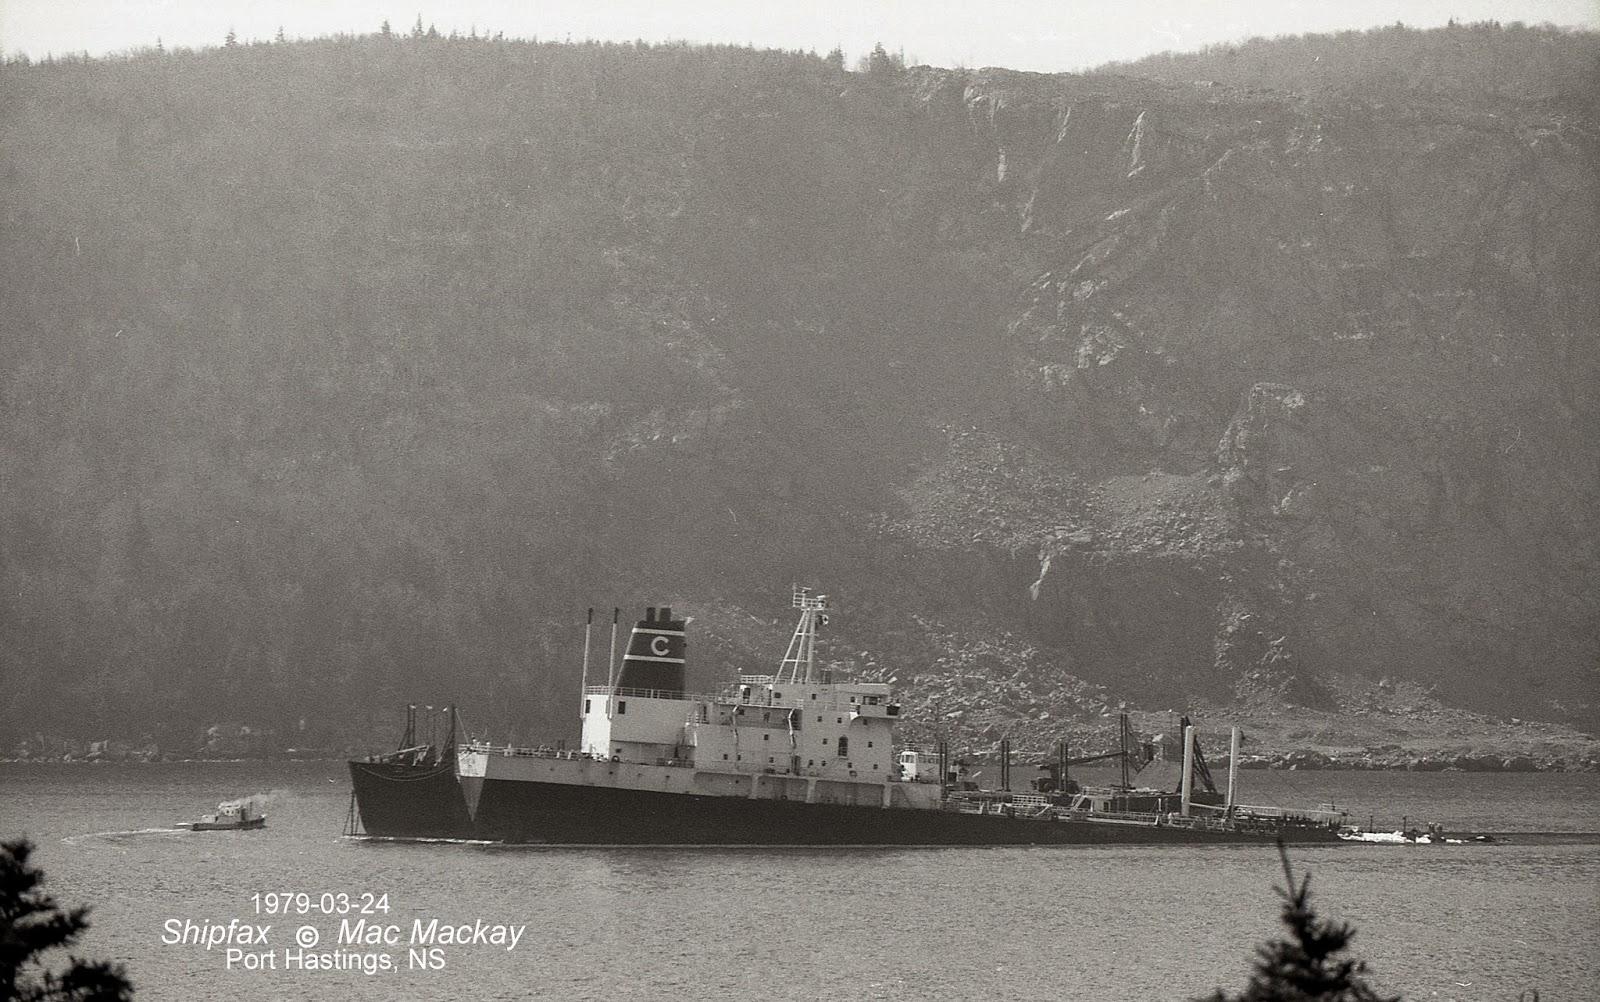 Shipfax Canadian Coast Guard Part 3 Lesser Lights